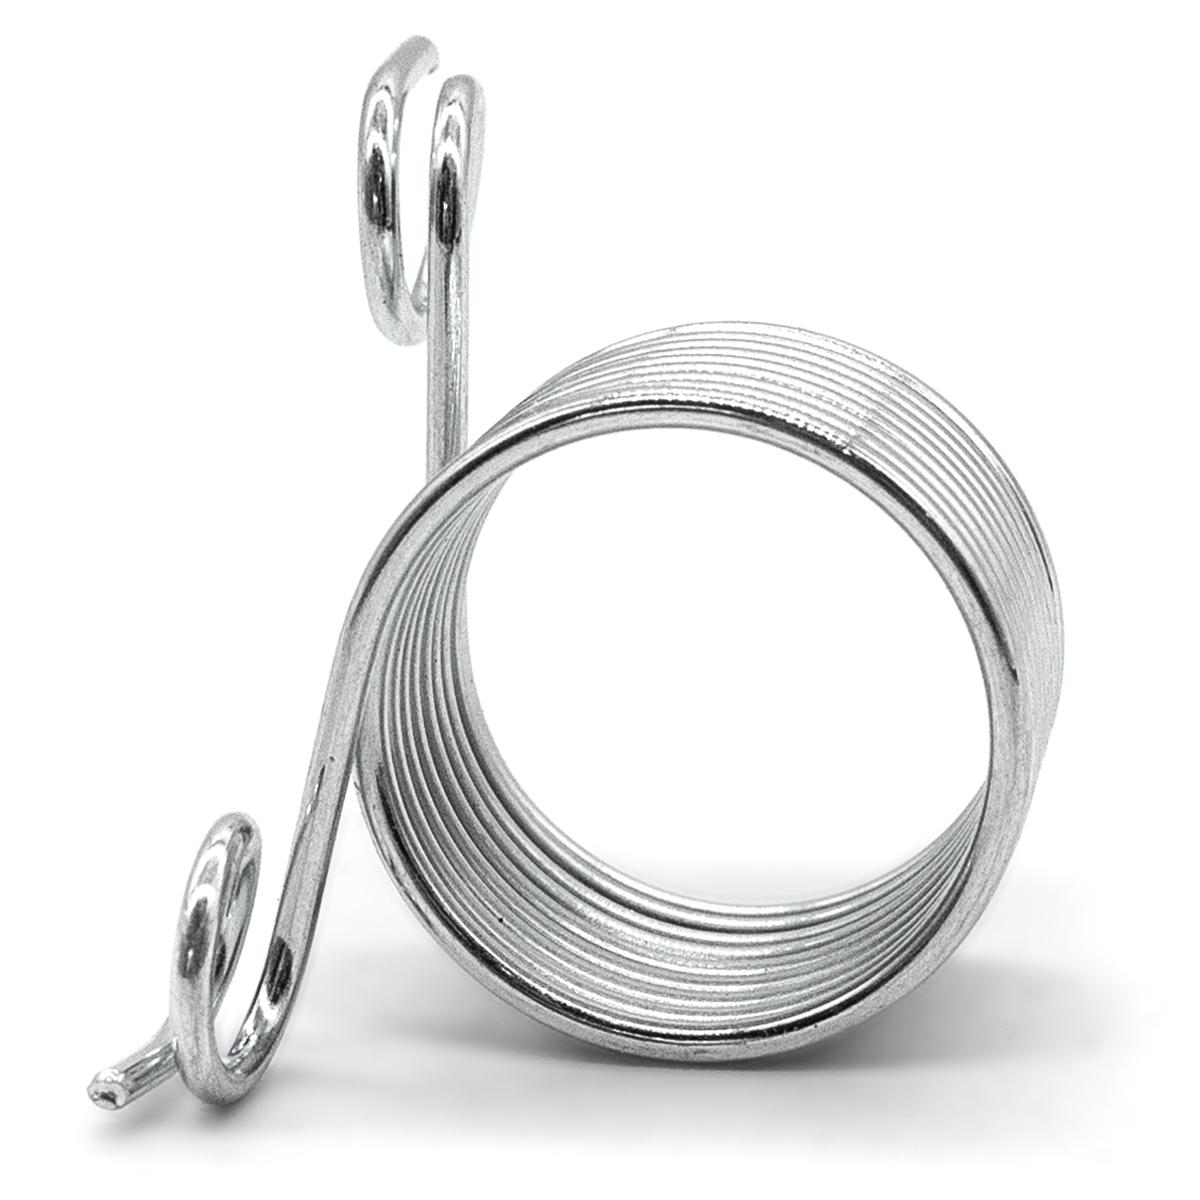 624144 Наперсток пружин. для вязания орнамента 'Норвежец', Prym